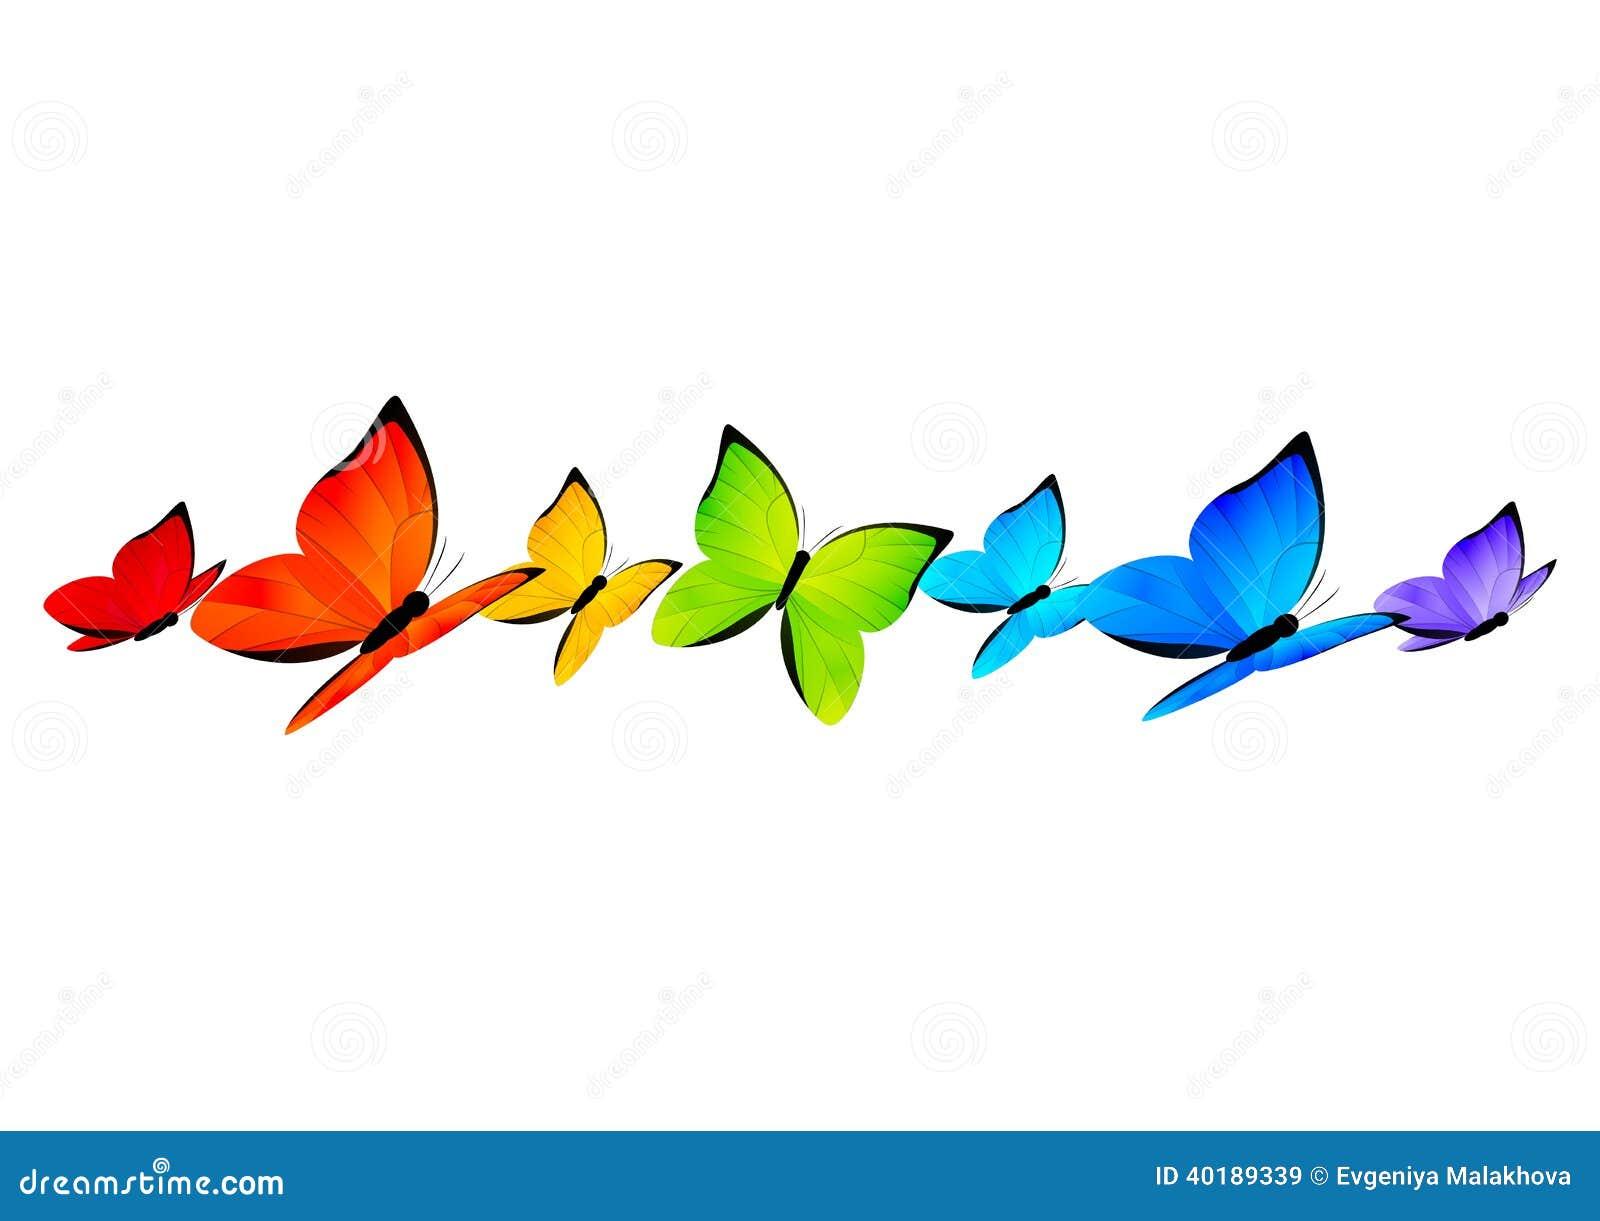 Rainbow Butterflies Border For Your Design 4 Stock Vector